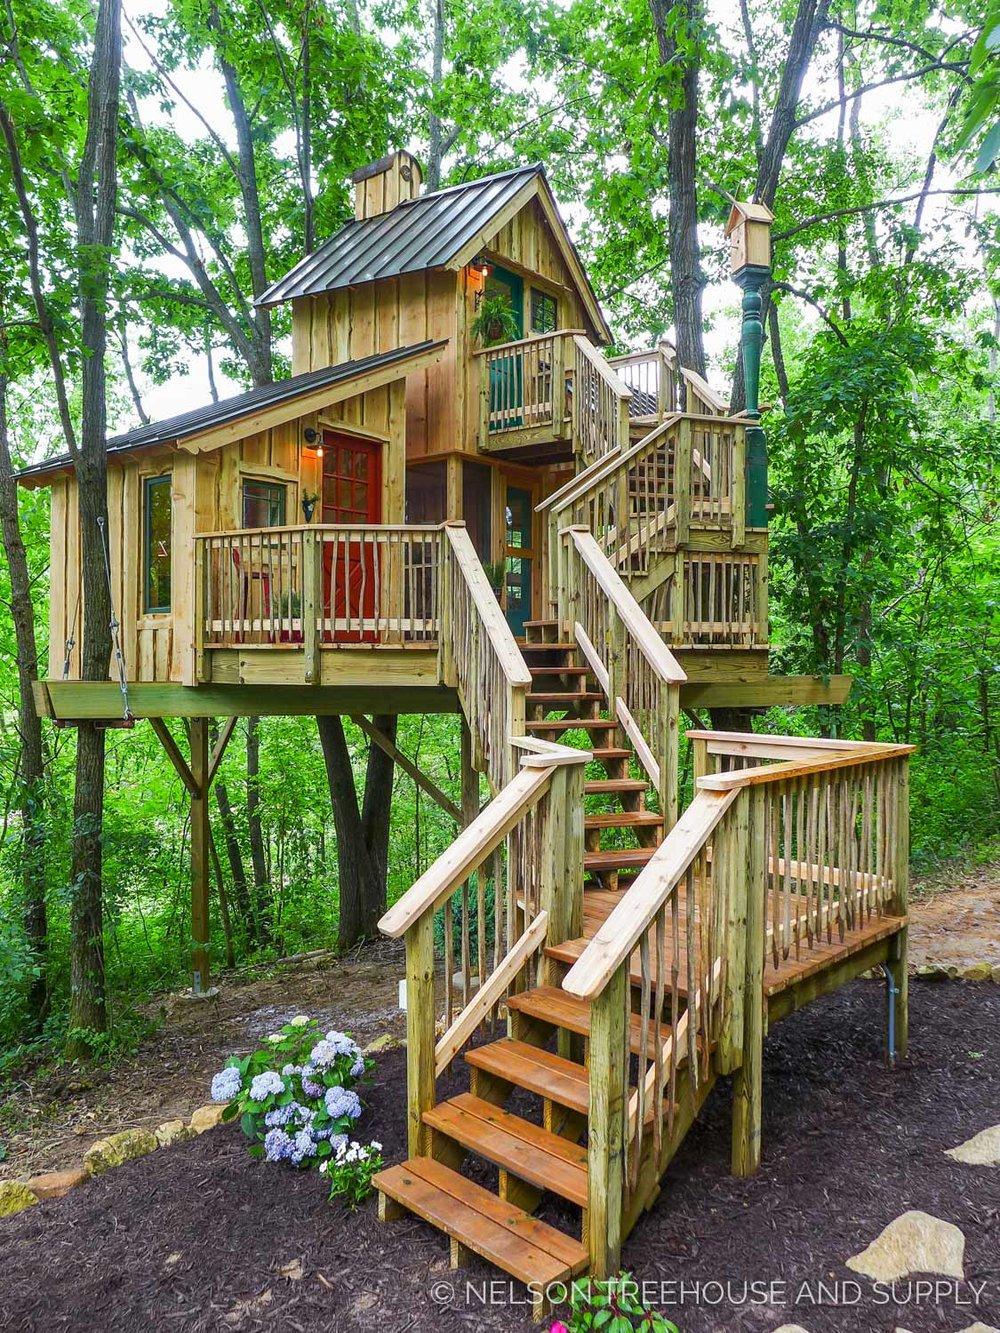 Bird barn treehouse nelson treehouse for Treeless treehouse